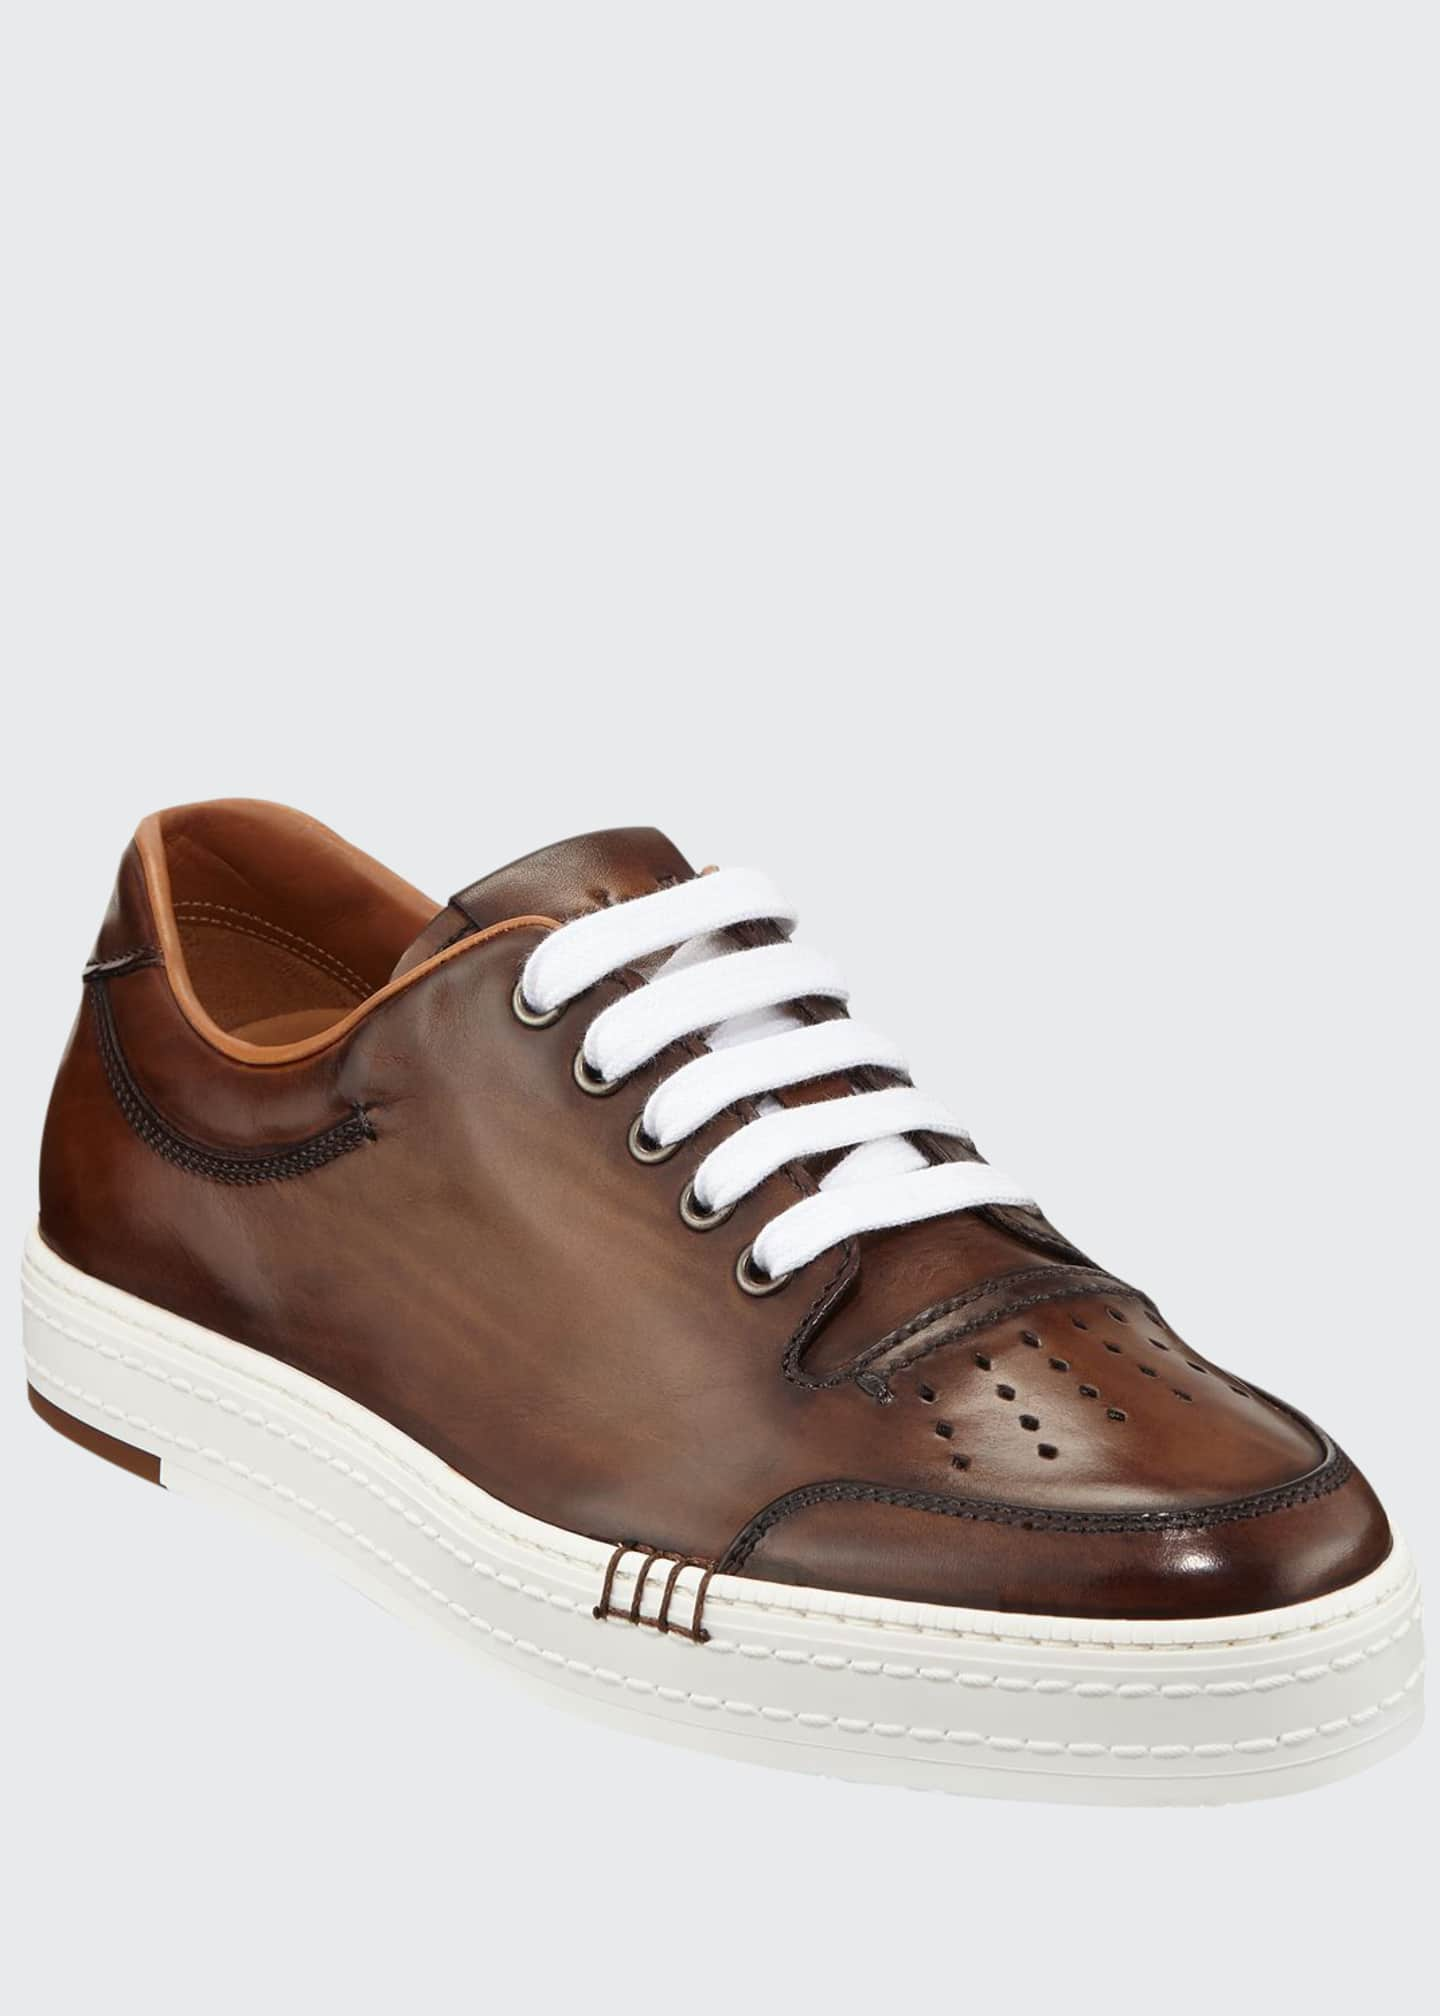 Berluti Men's Playtime Palermo Calf Leather Sneaker